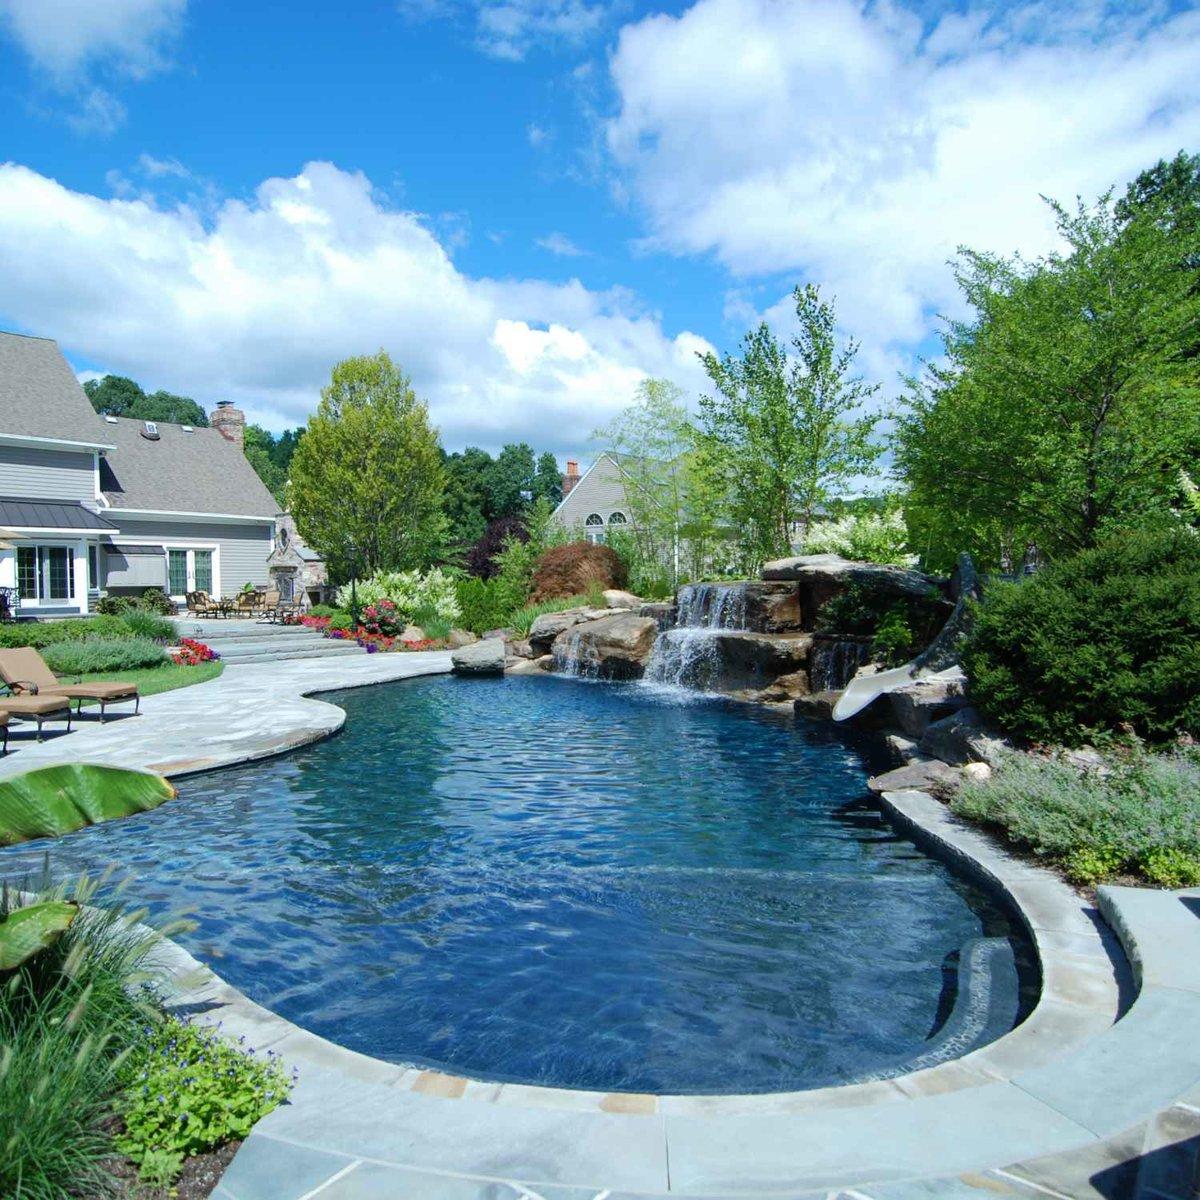 epic private backyard pools - HD1200×1200